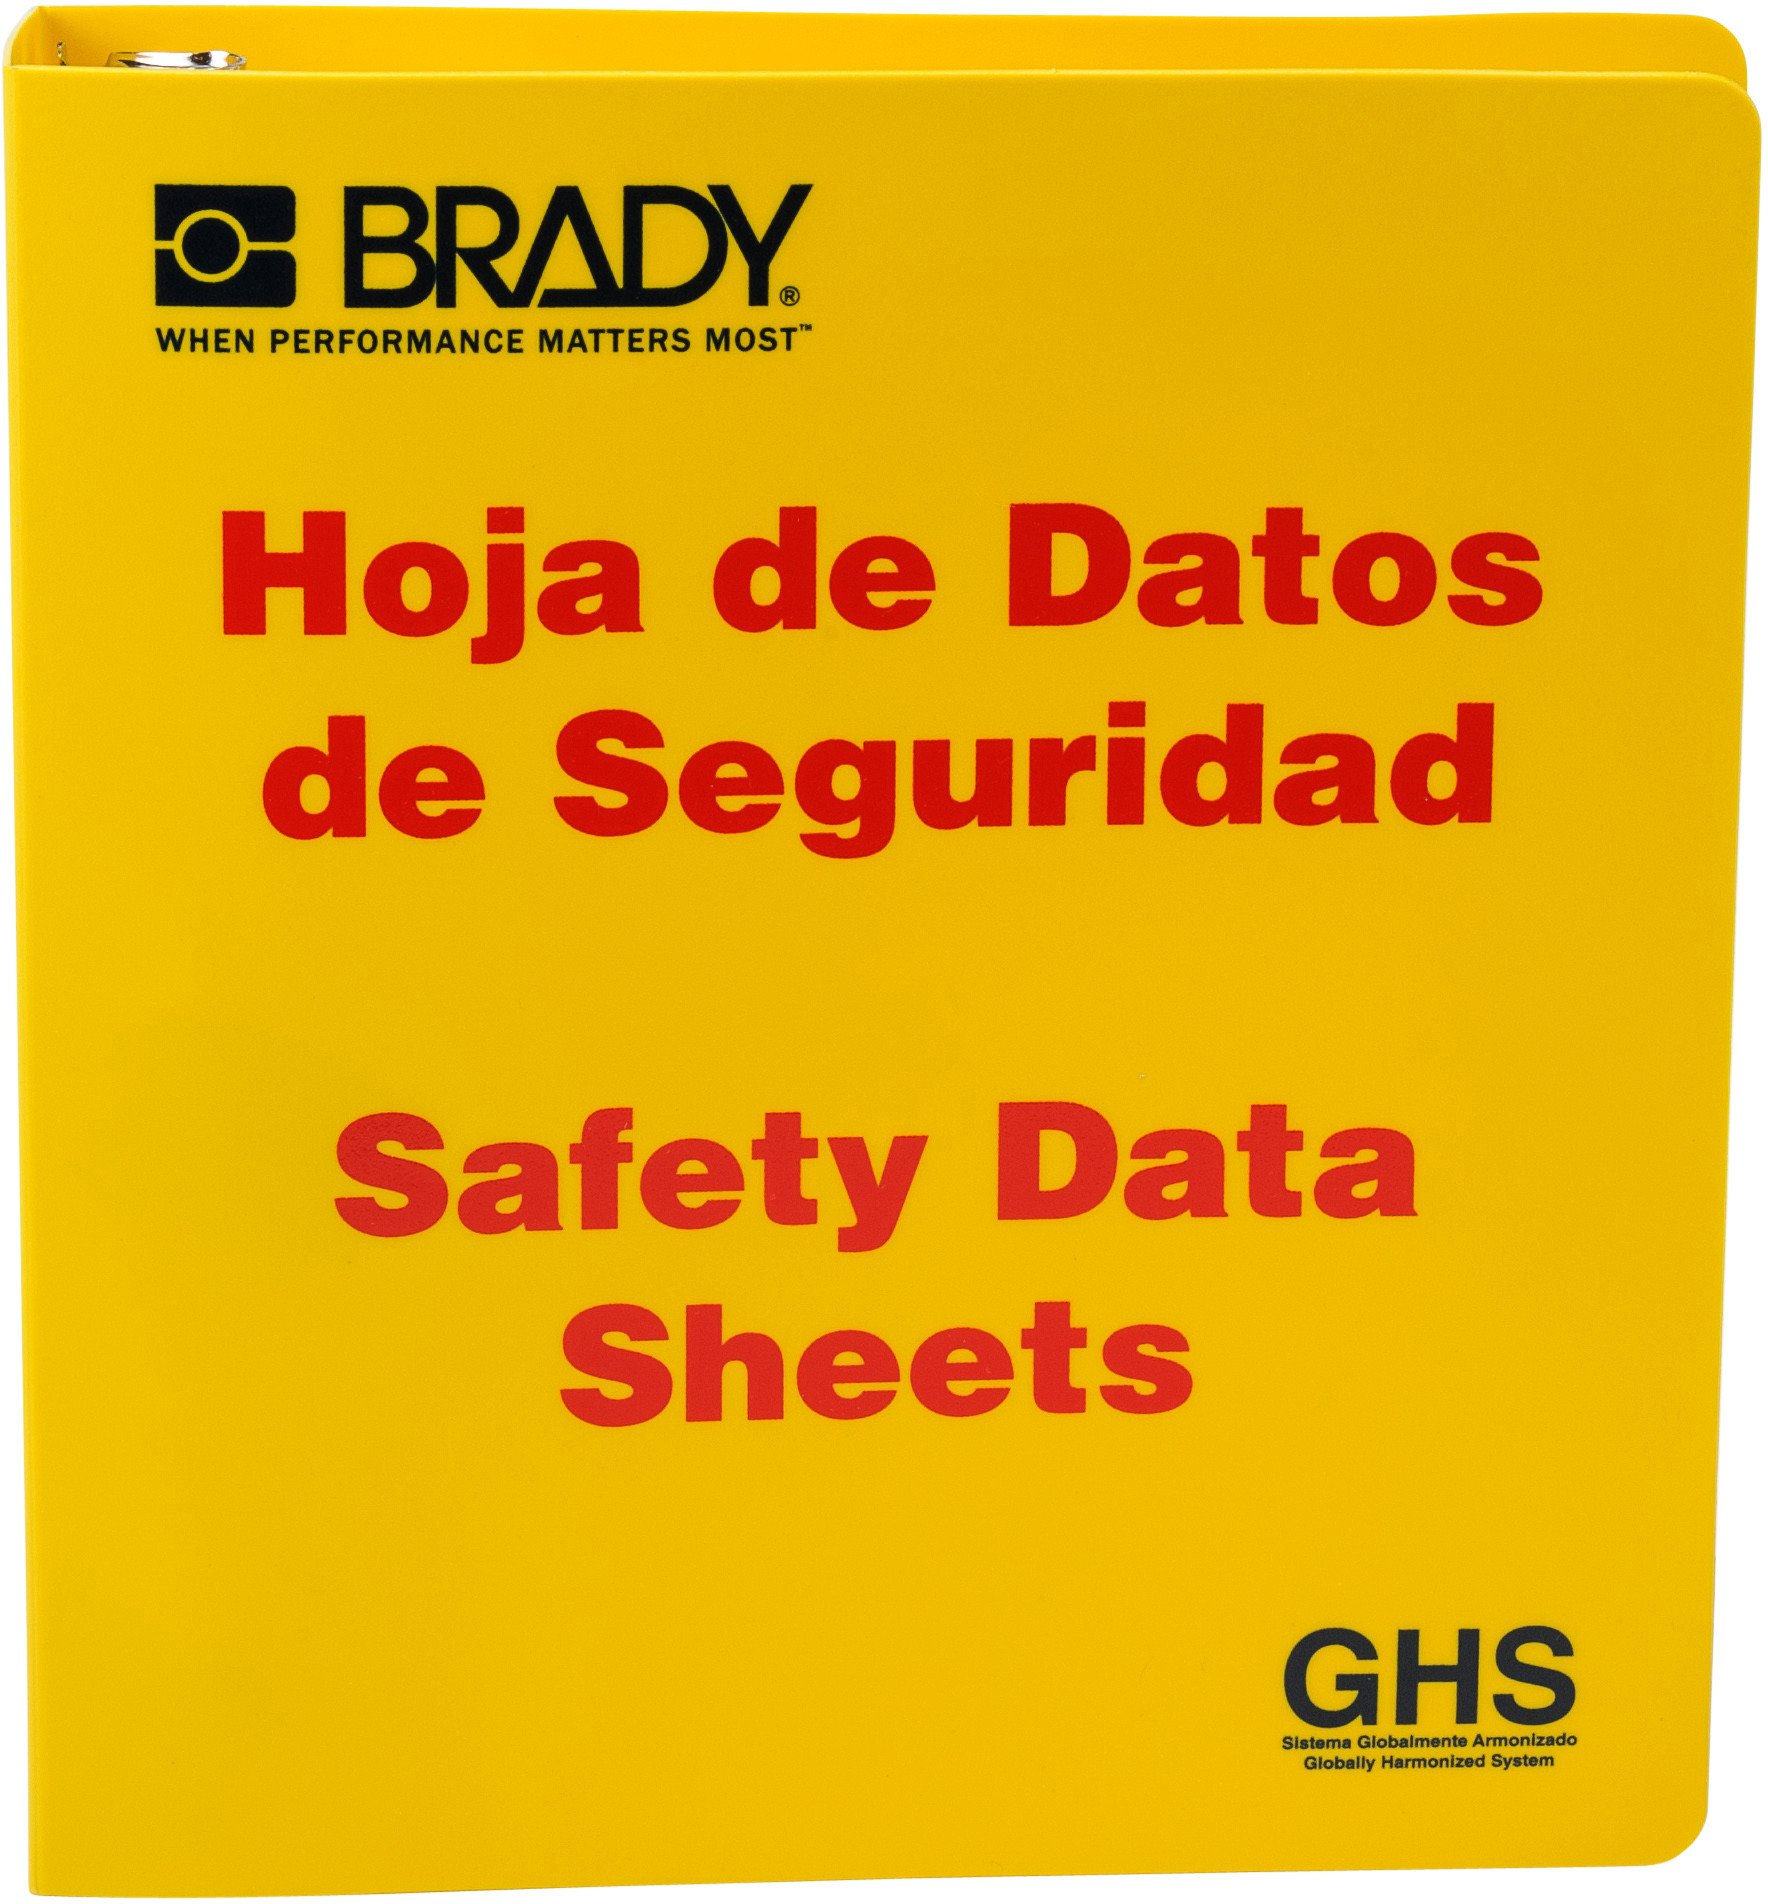 Brady 121185 GHS - 1.5'' Safety Data Sheet Binder - Spanish